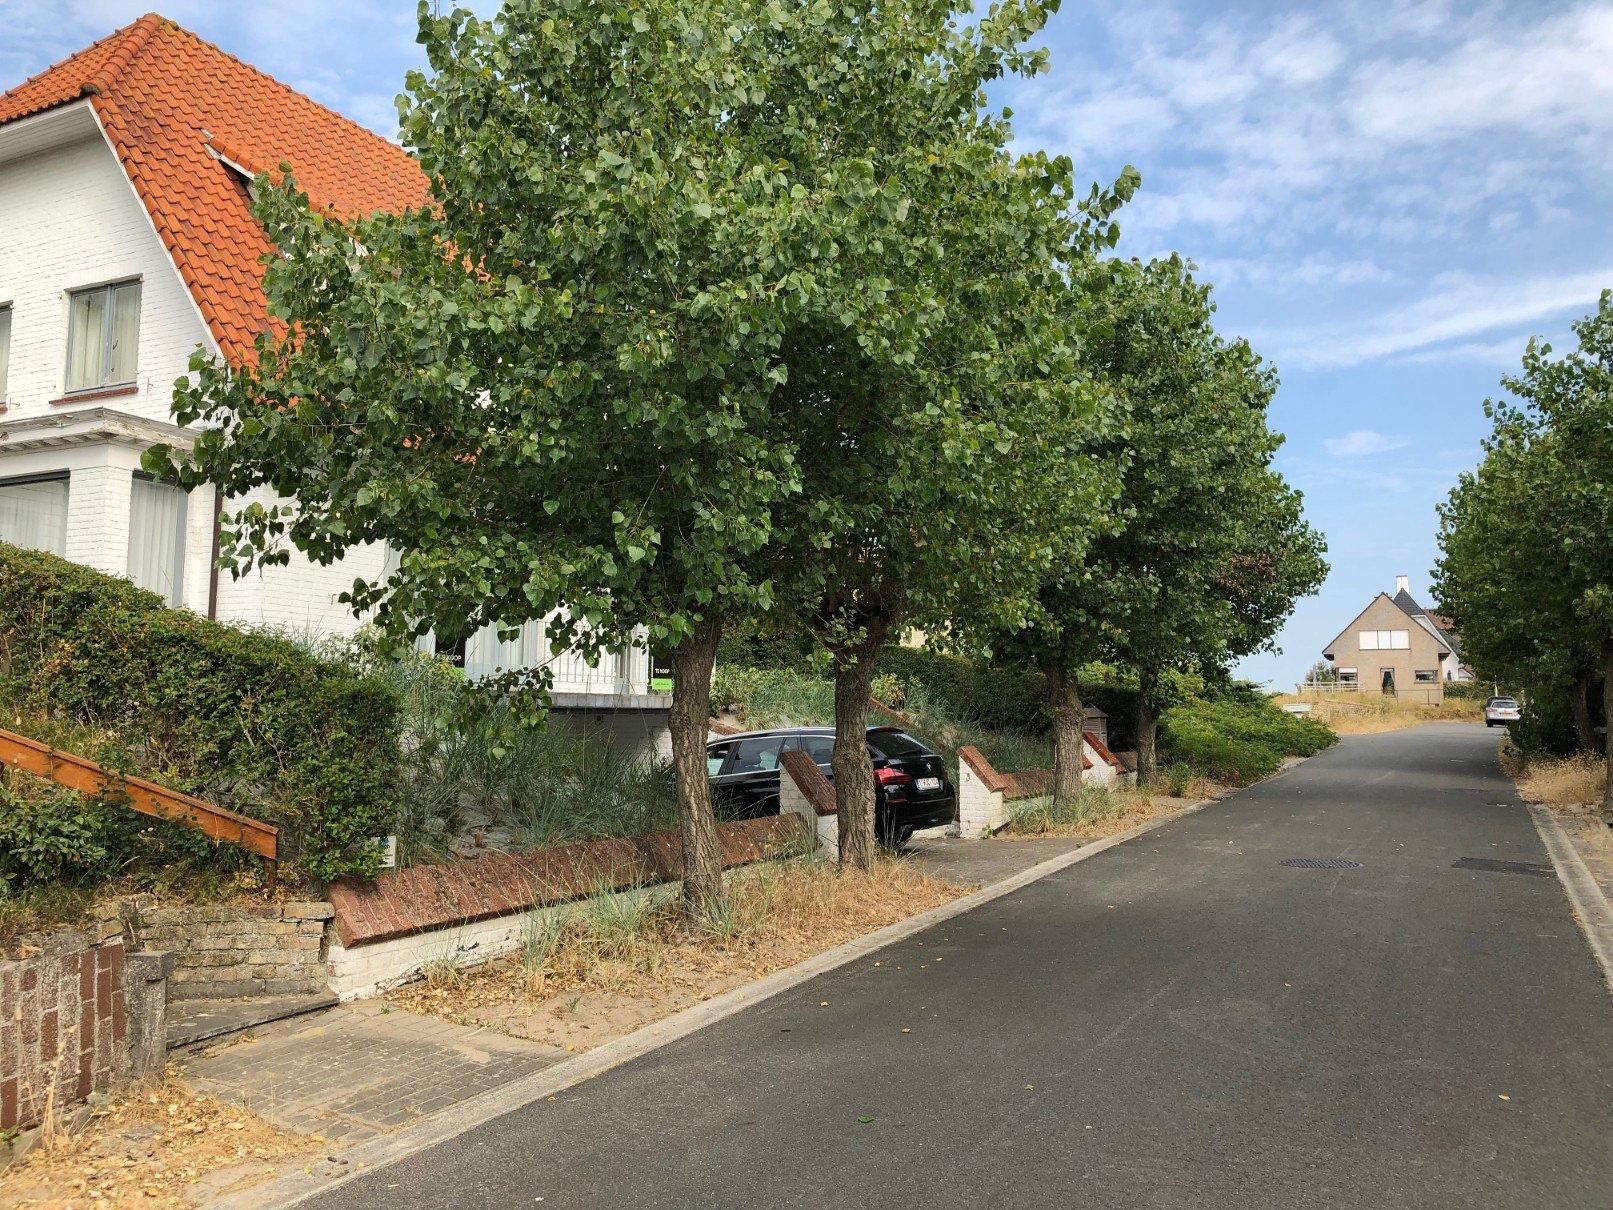 Rietveldprojects-Villa Were Di - Te Koop : Te Huur (per week)23.jpg